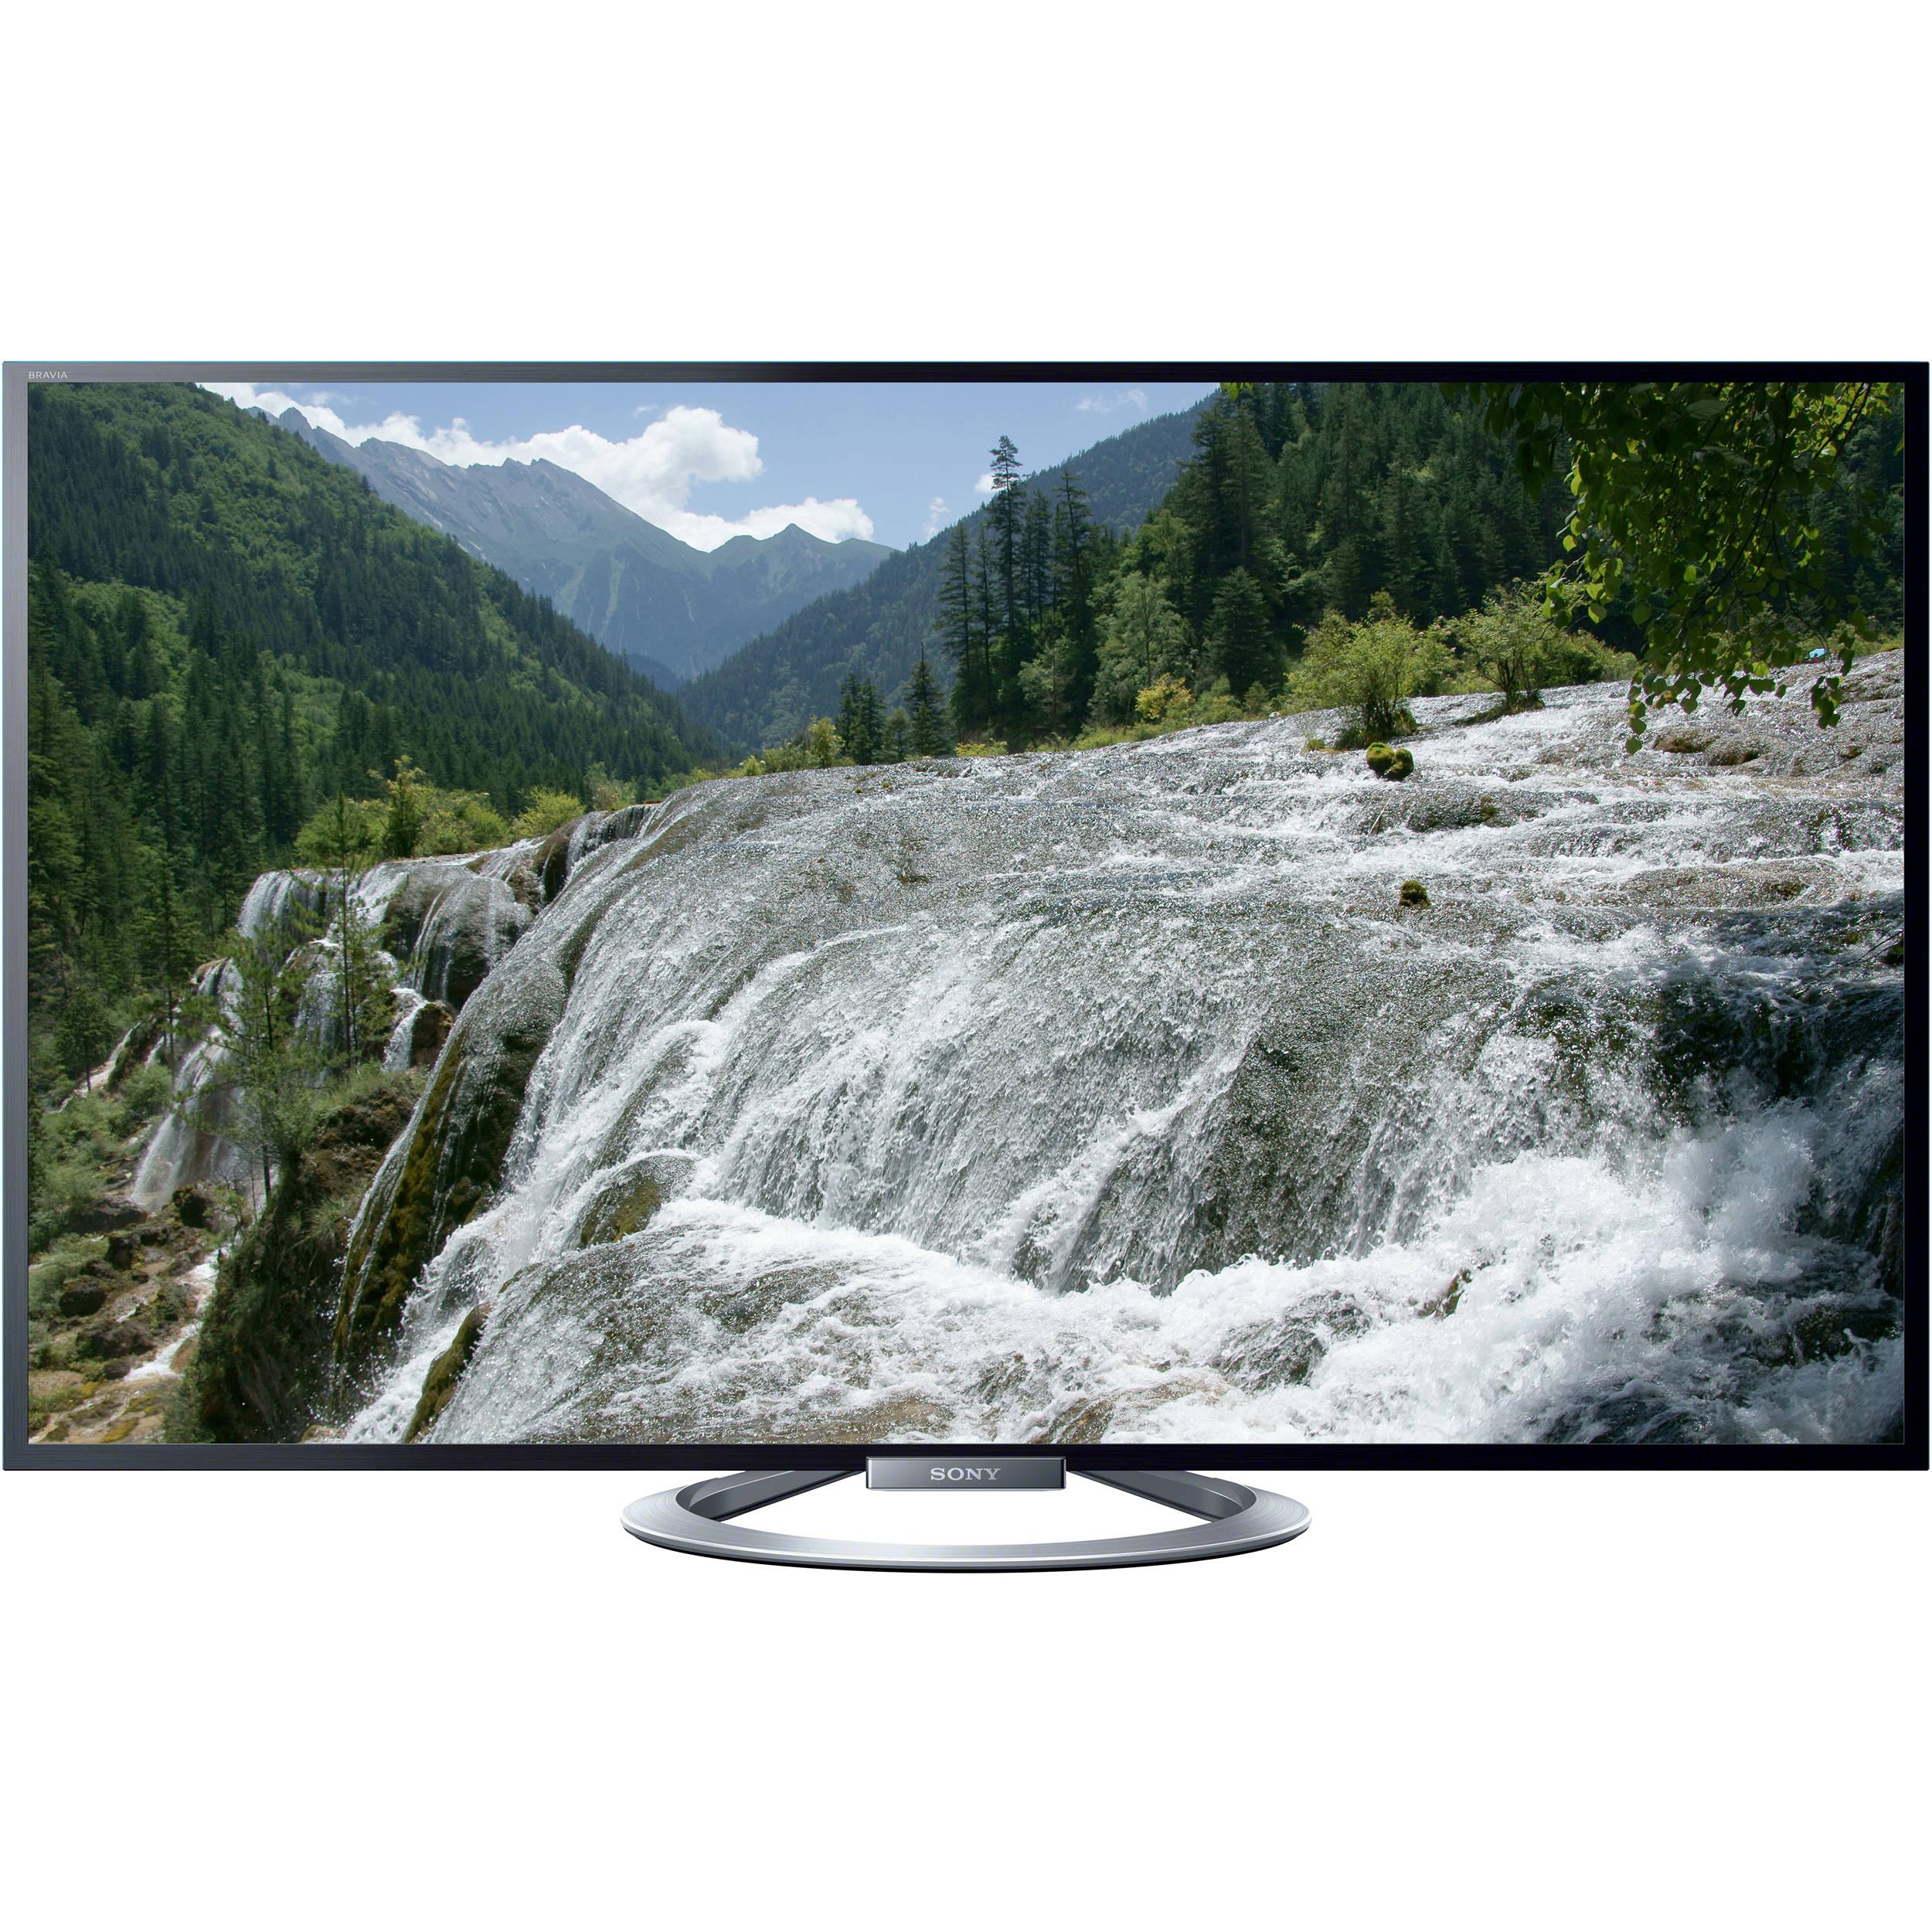 Sony BRAVIA KDL-55W802A HDTV Windows 8 X64